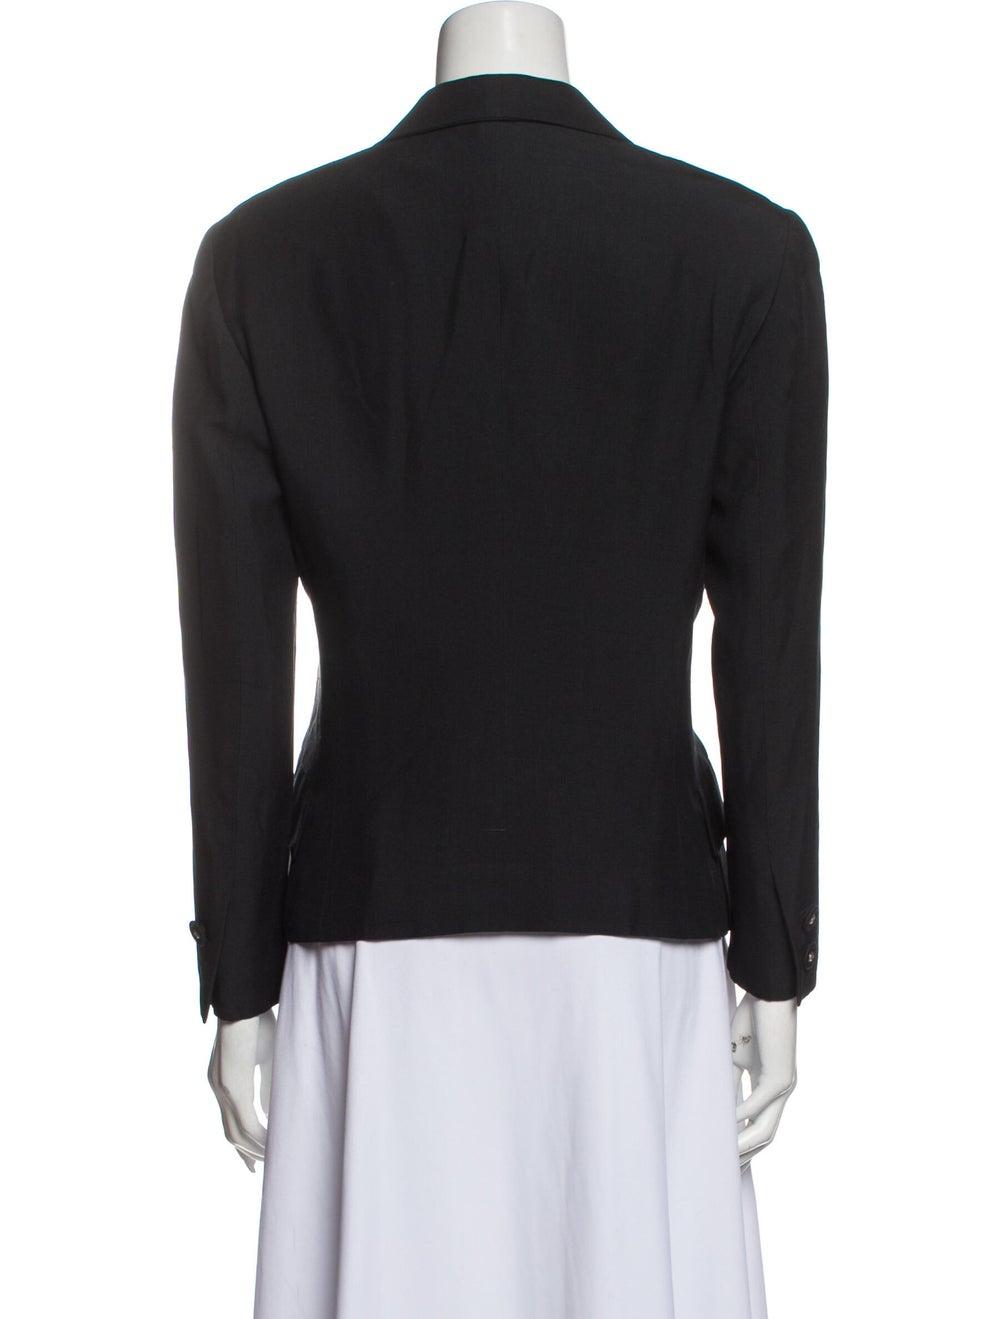 Gianni Versace Vintage Blazer Black - image 3